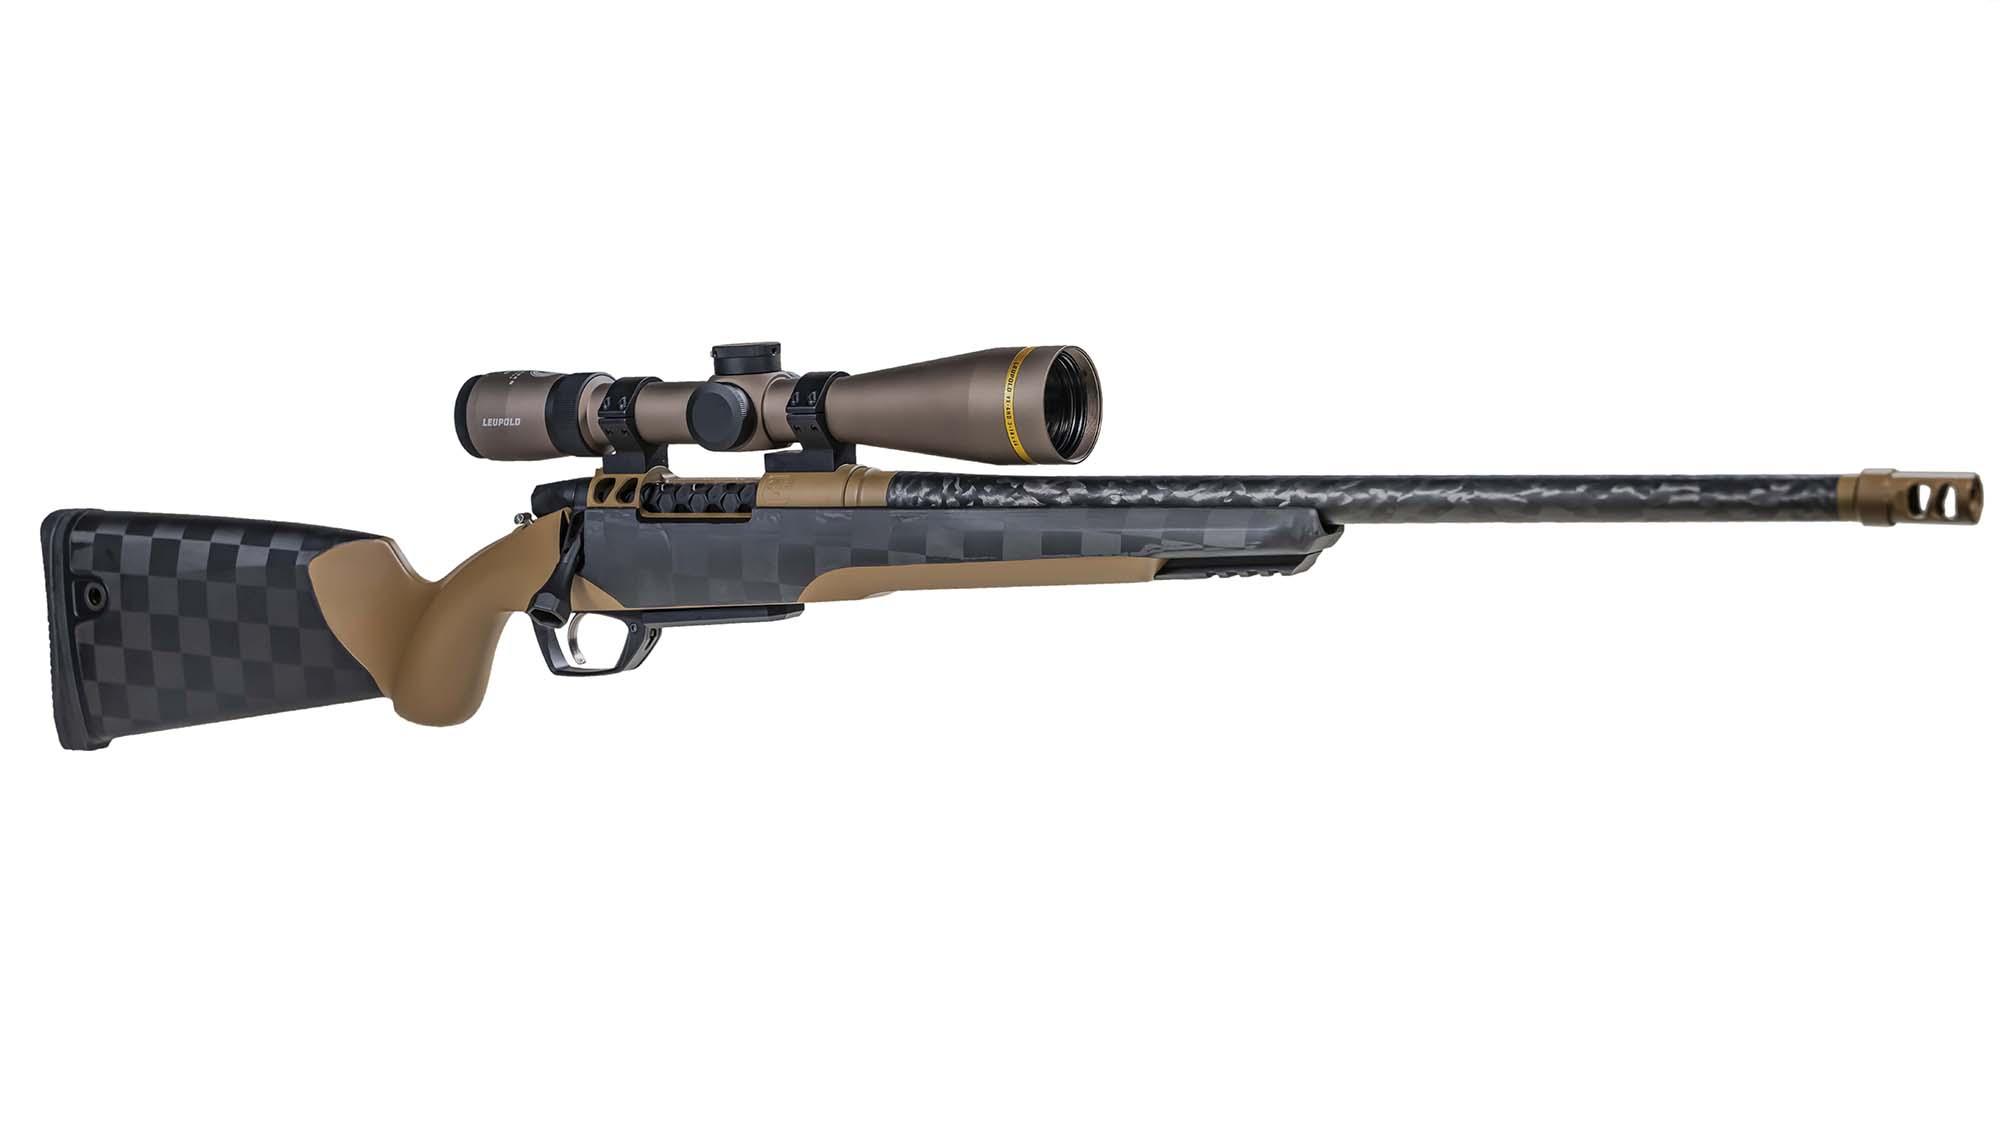 gunwerks skunkwerks the cut rifle system 7 saum 6.5 prc precision rifle